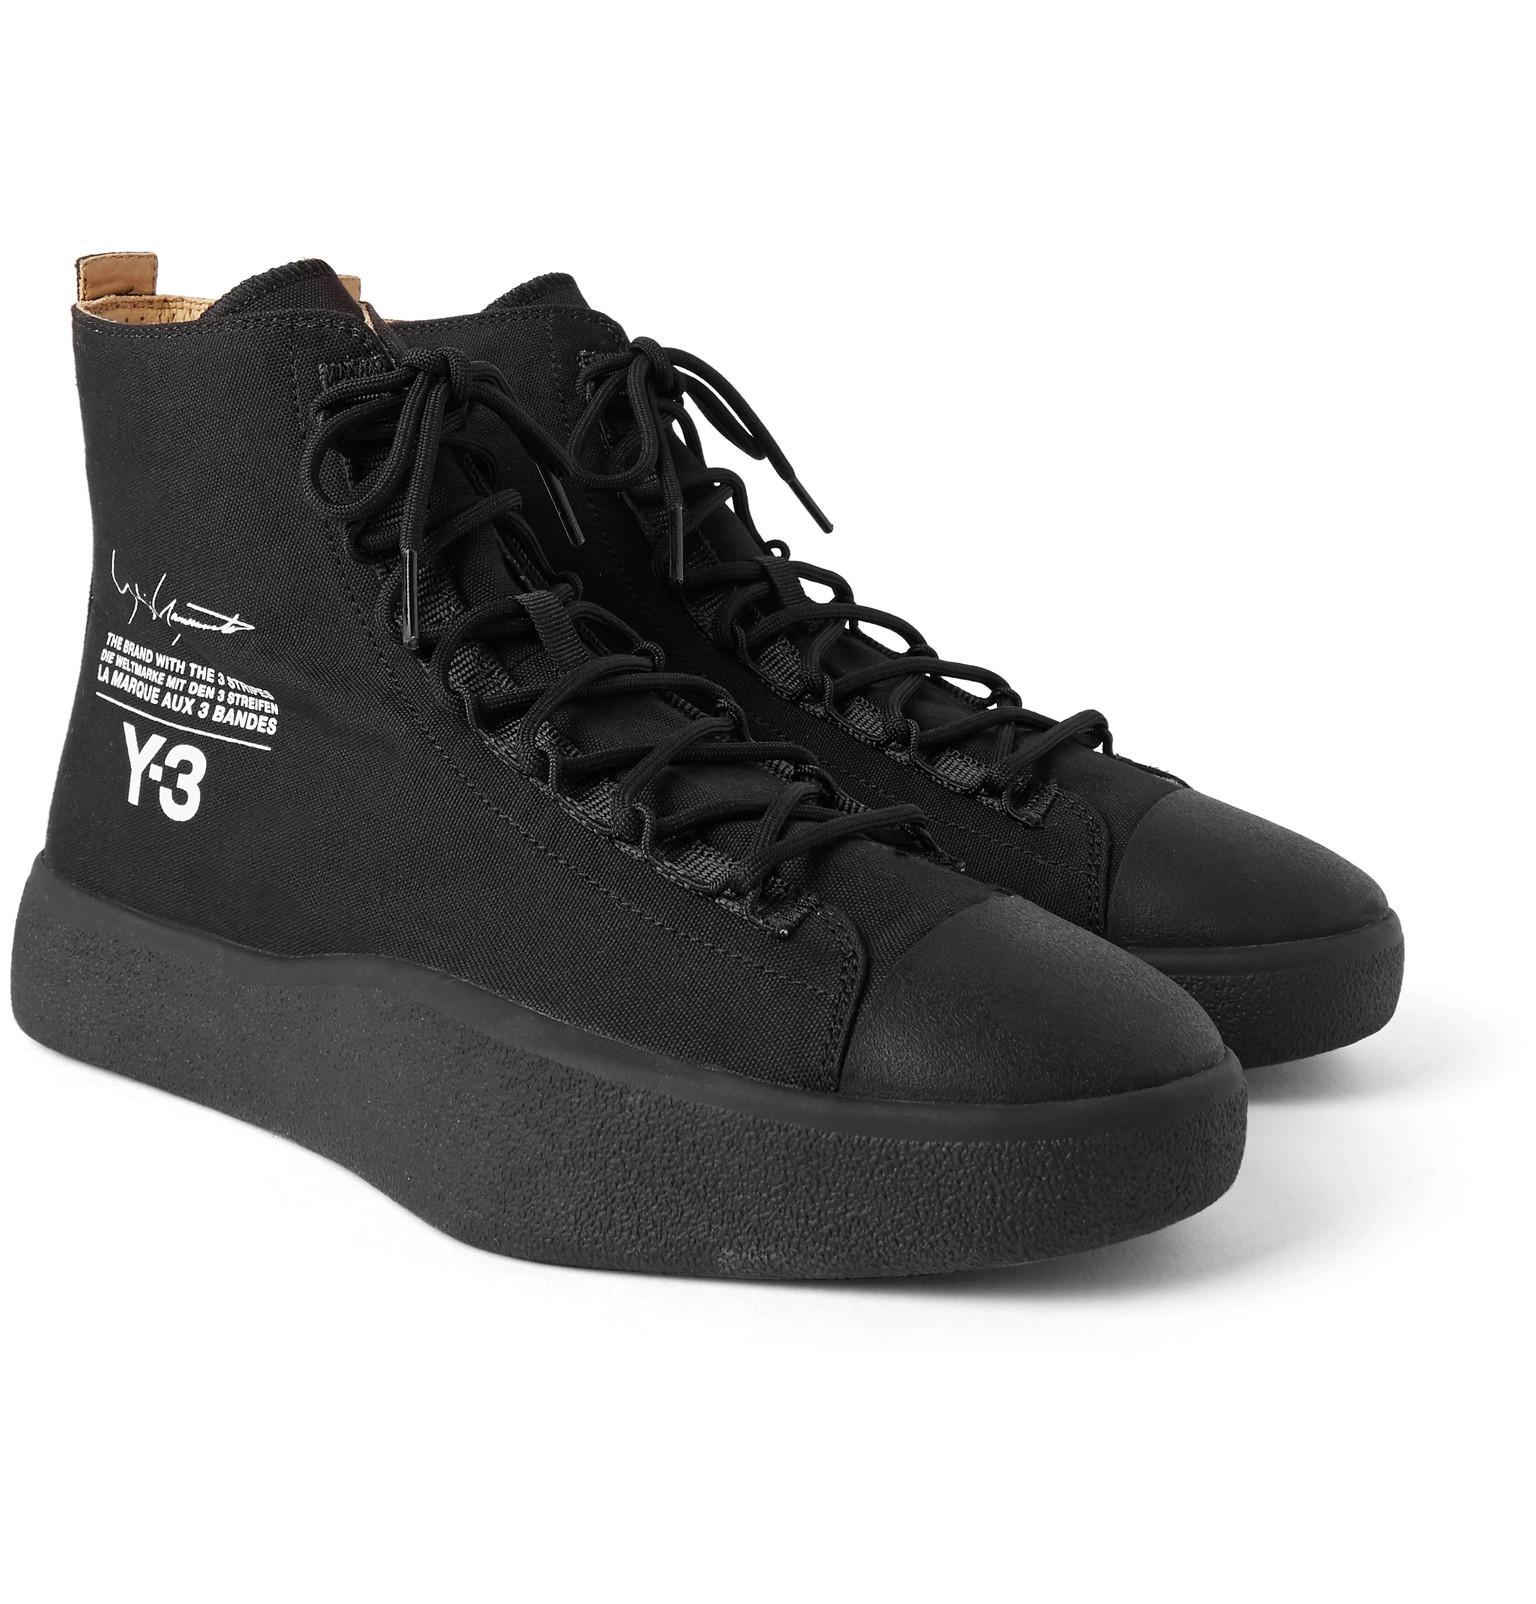 Y-3 Bashyo Floral Hi-Top Sneakers pFdp6xl